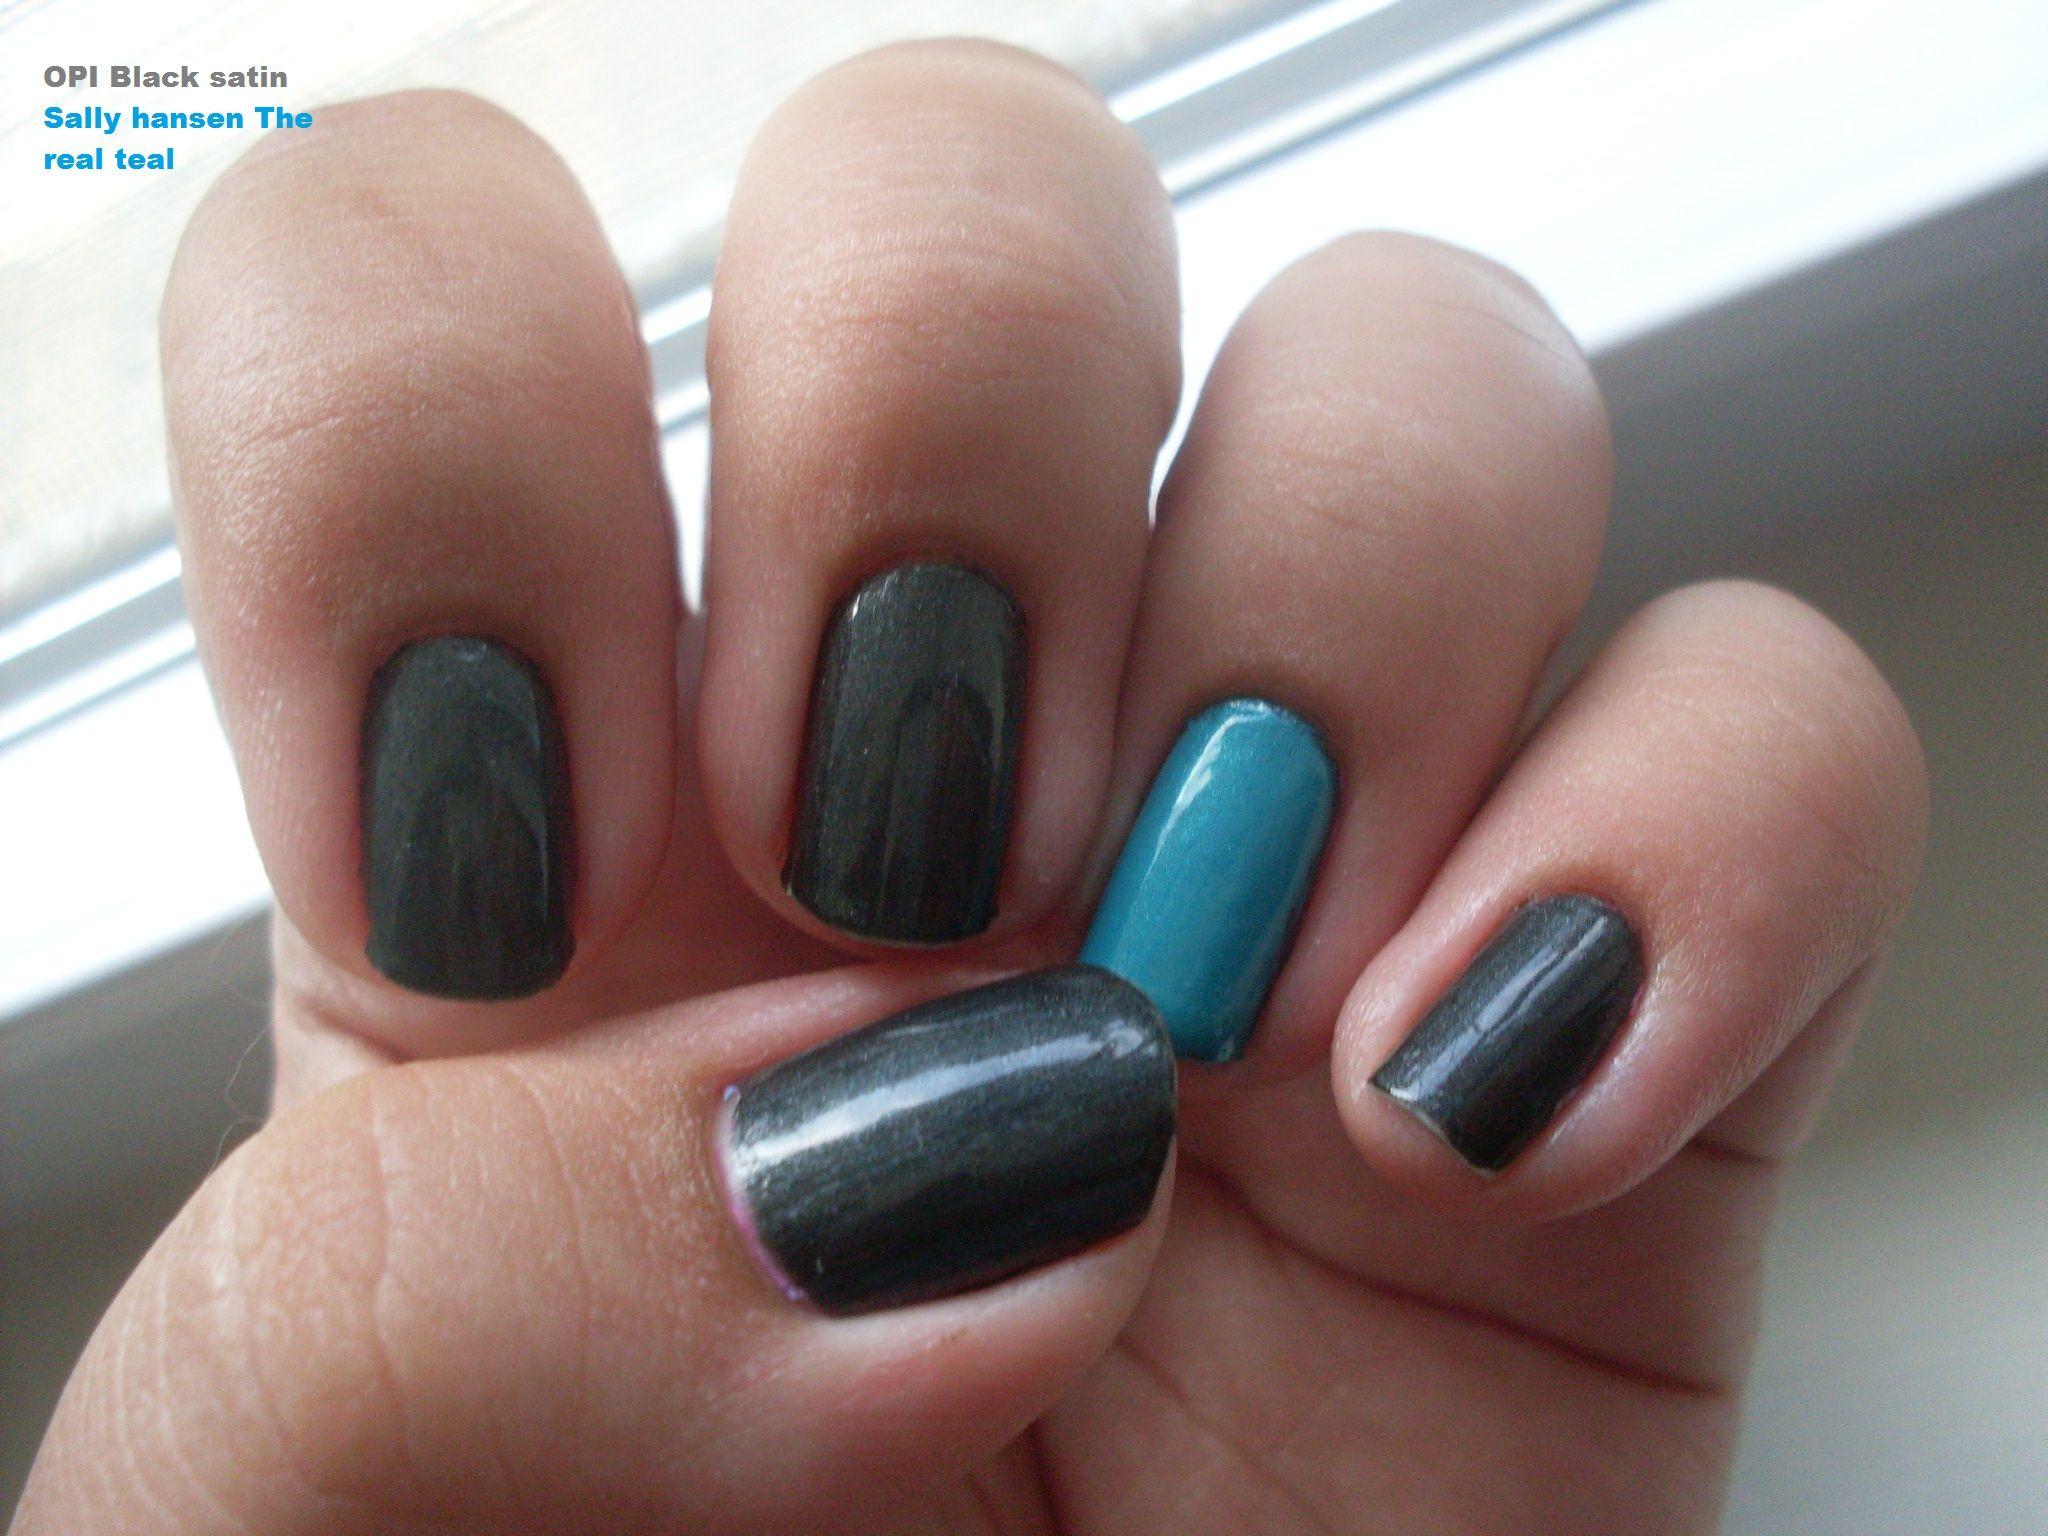 Dark grey nails with teal accent nail   Nails   Pinterest   Dark ...